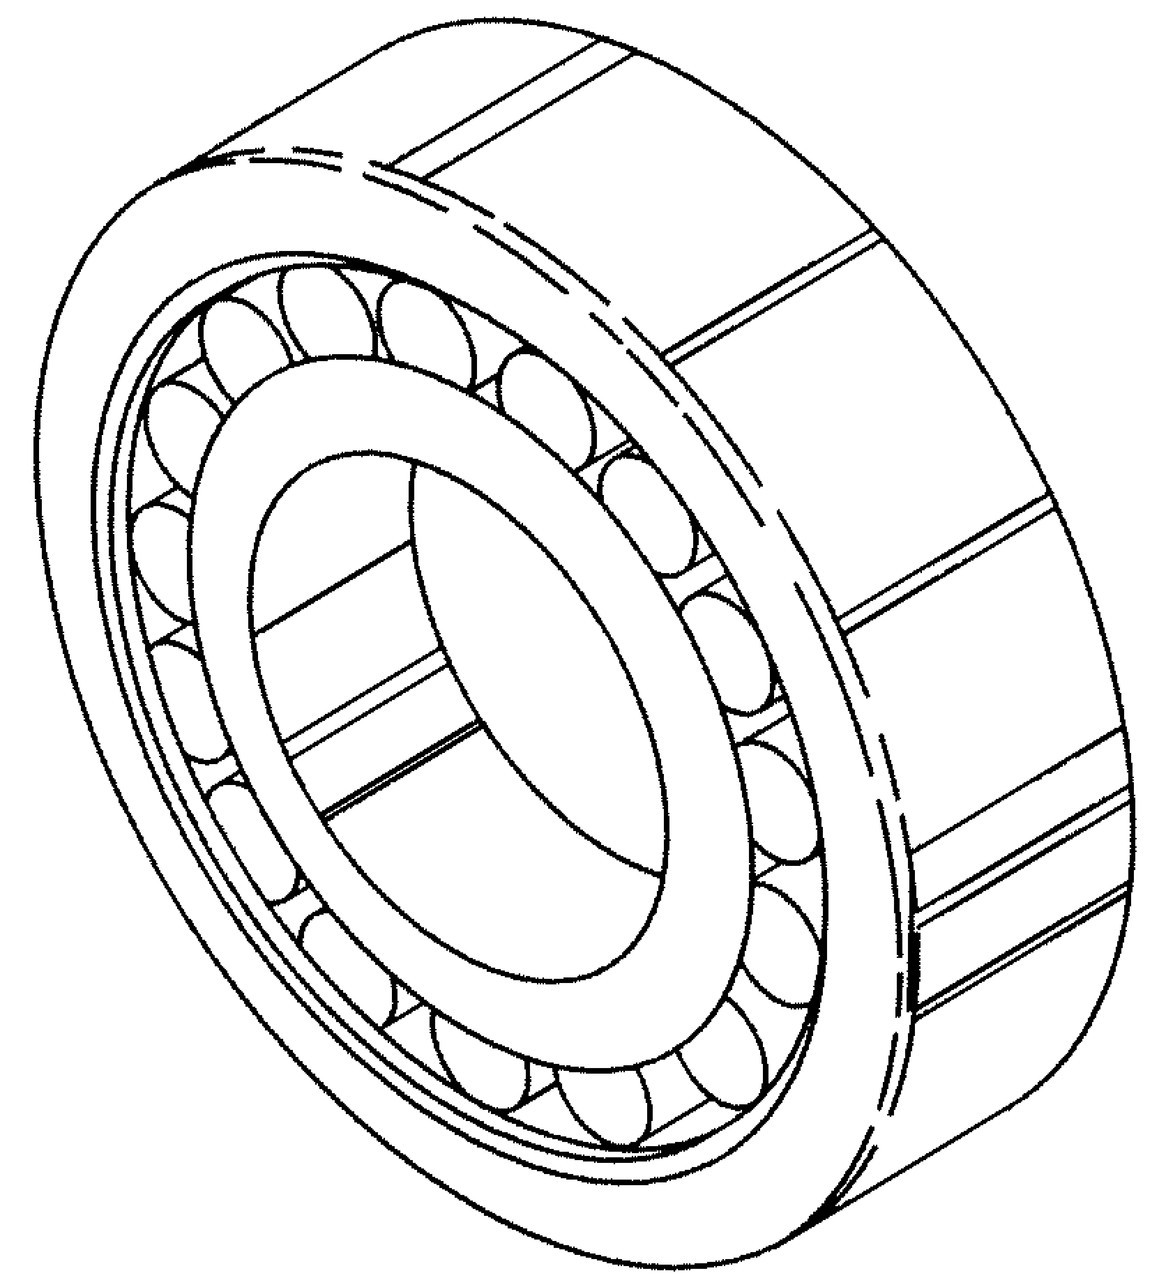 Butcher Boy SA30 & SA36 - Lower Main Bearing (Roller) Front - 90315 - BB158